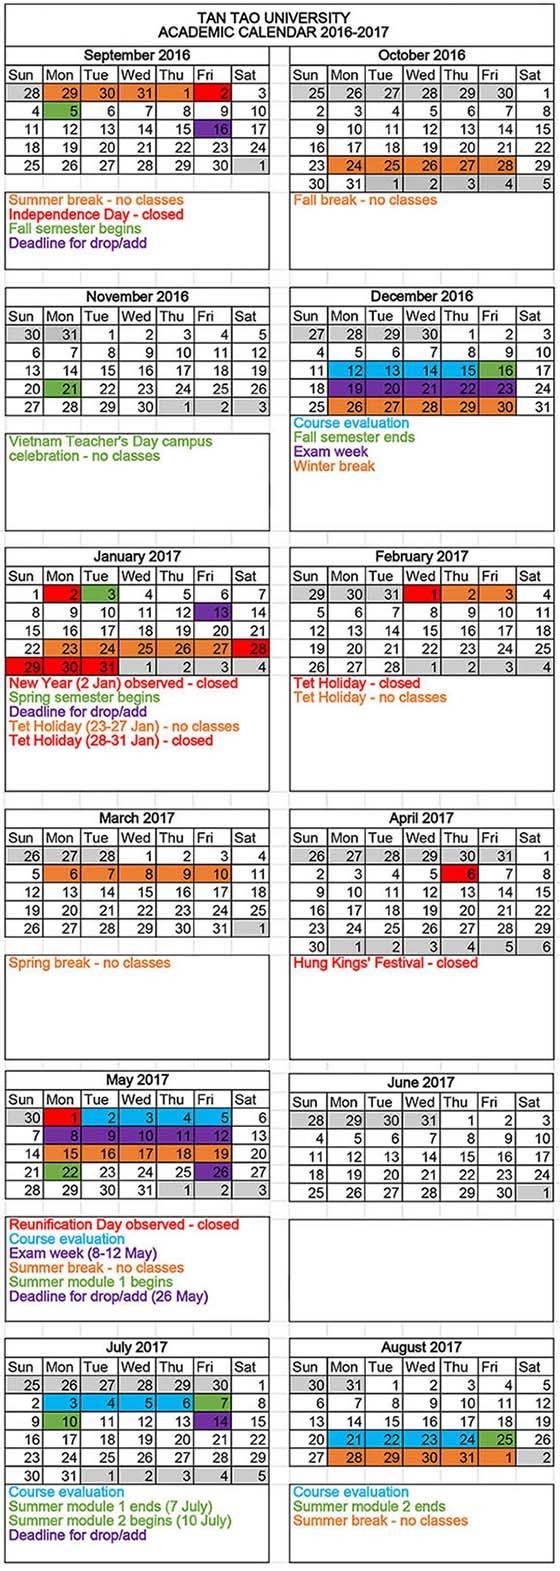 Academic Calendar Tan Tao University